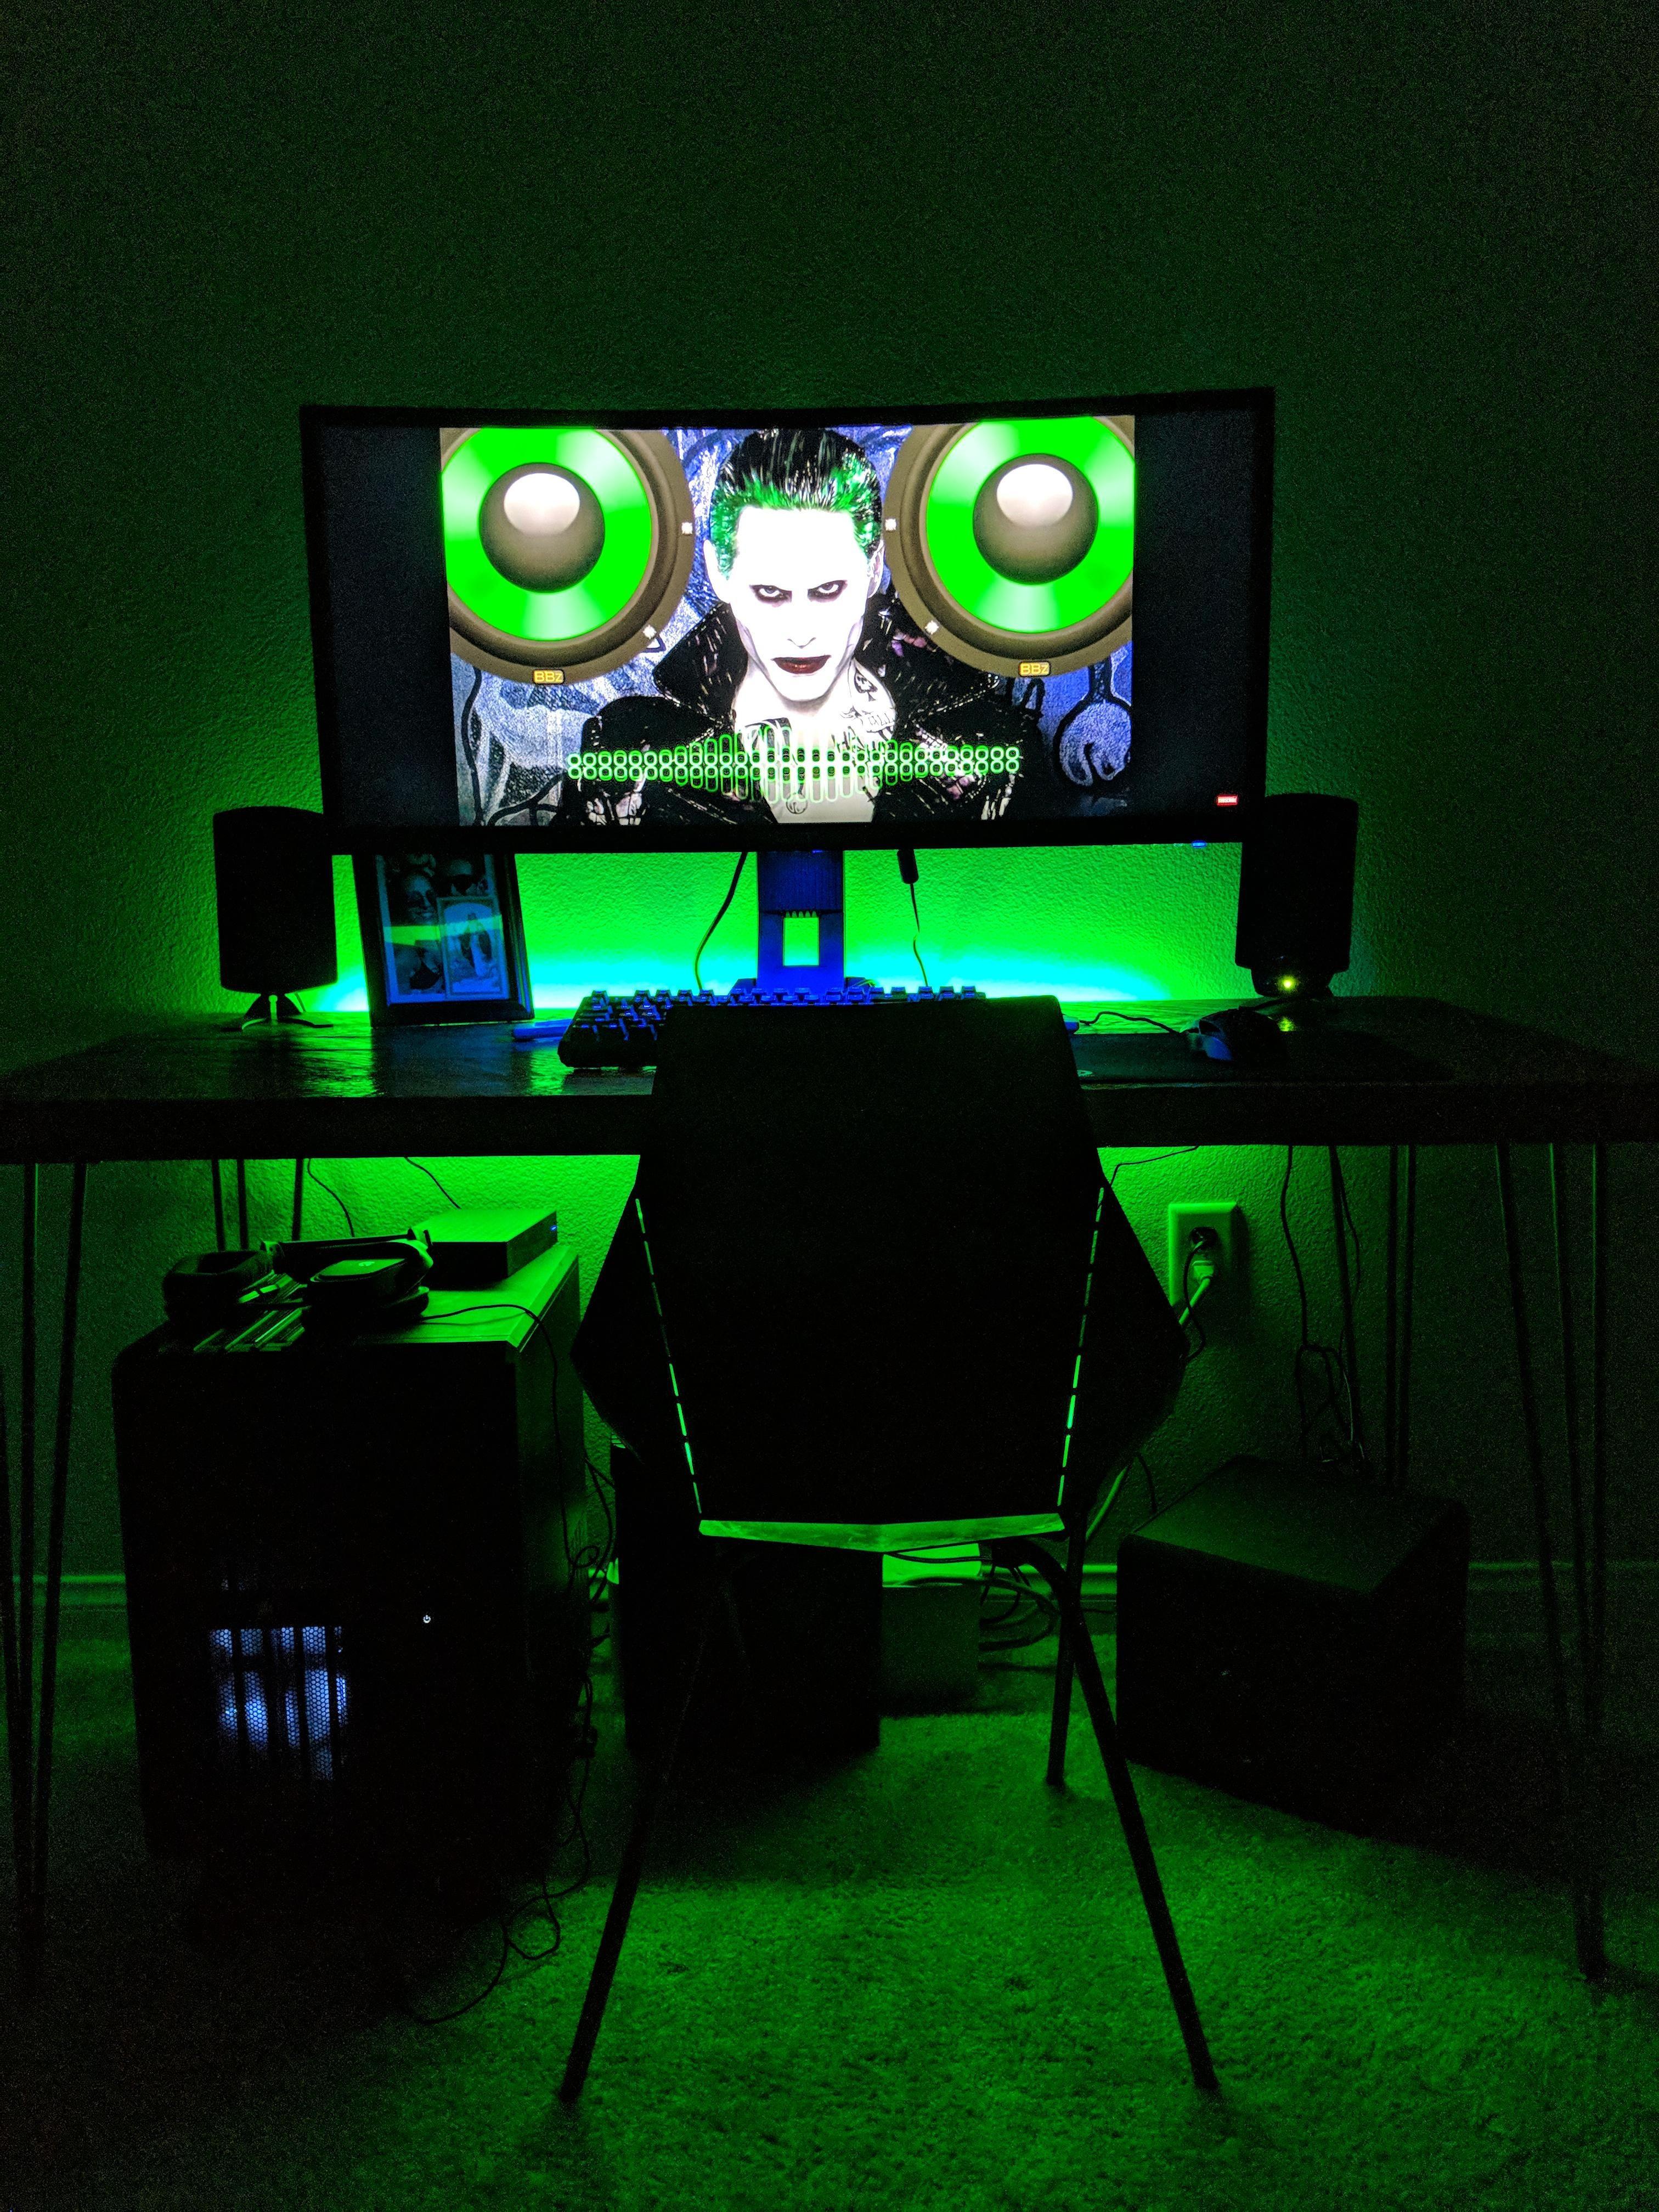 8 Year Old Rig Time For An Upgrade Laptop Gaming Setup Pc Setup Desktop Setup